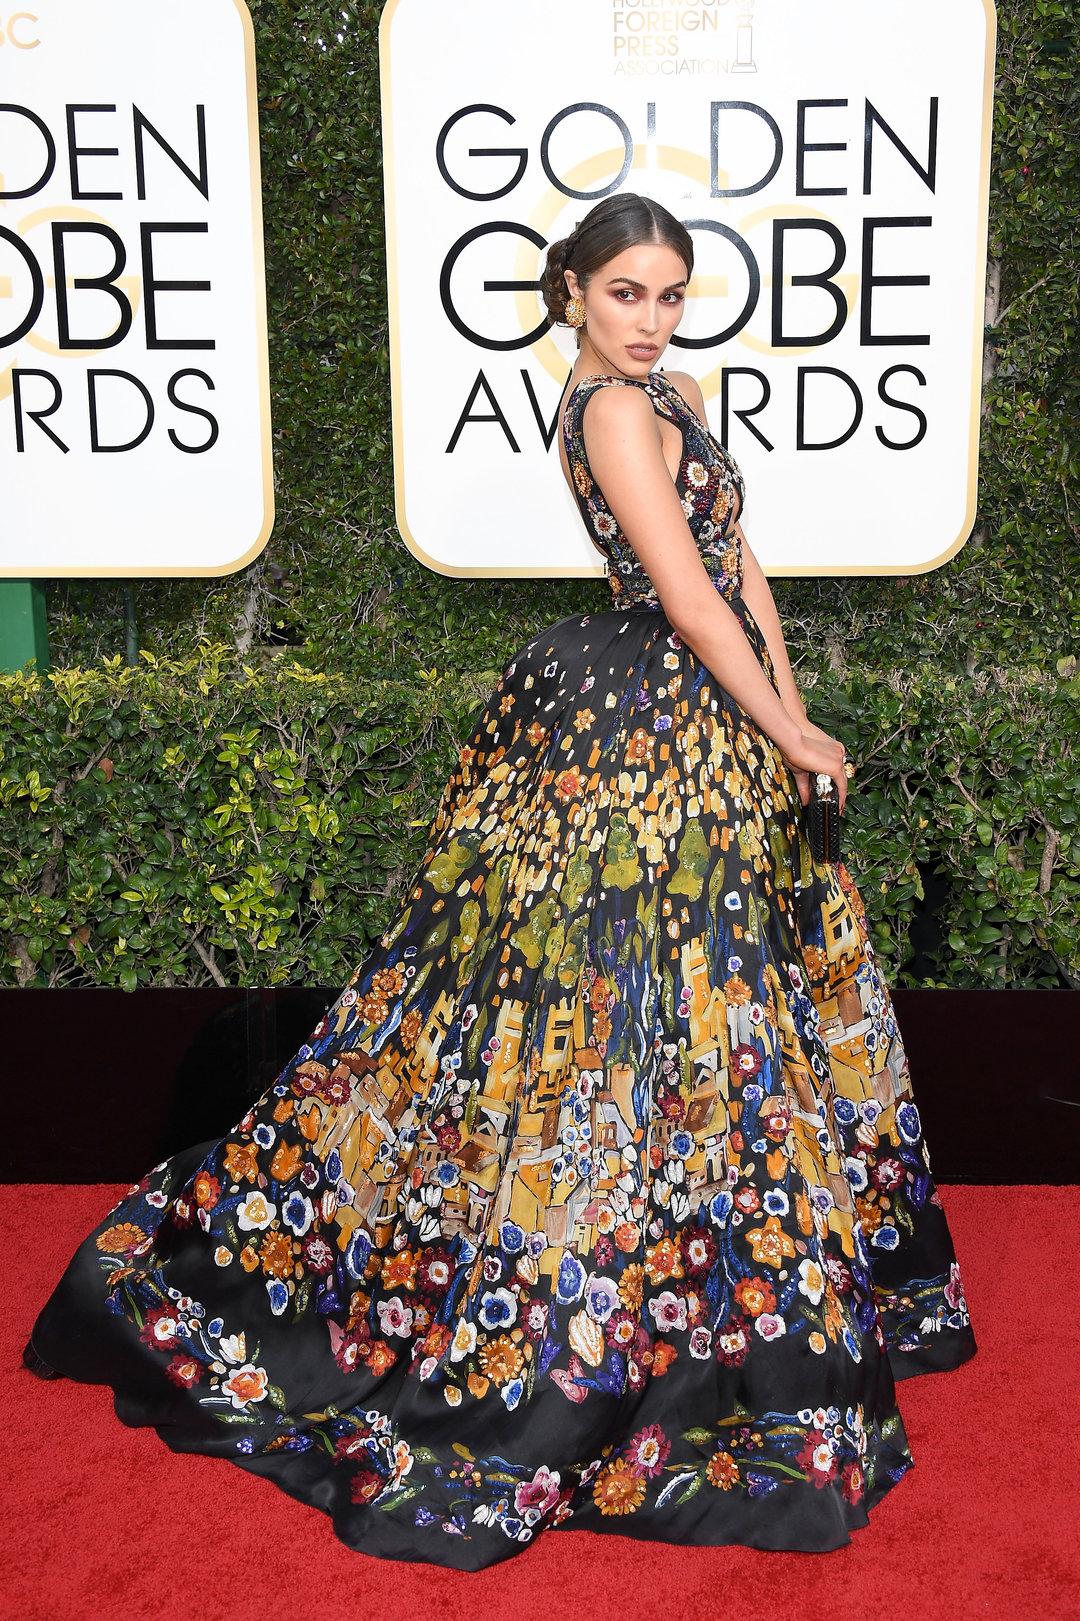 The Golden Globe Awards 2017 Golden Globes Best Dressed